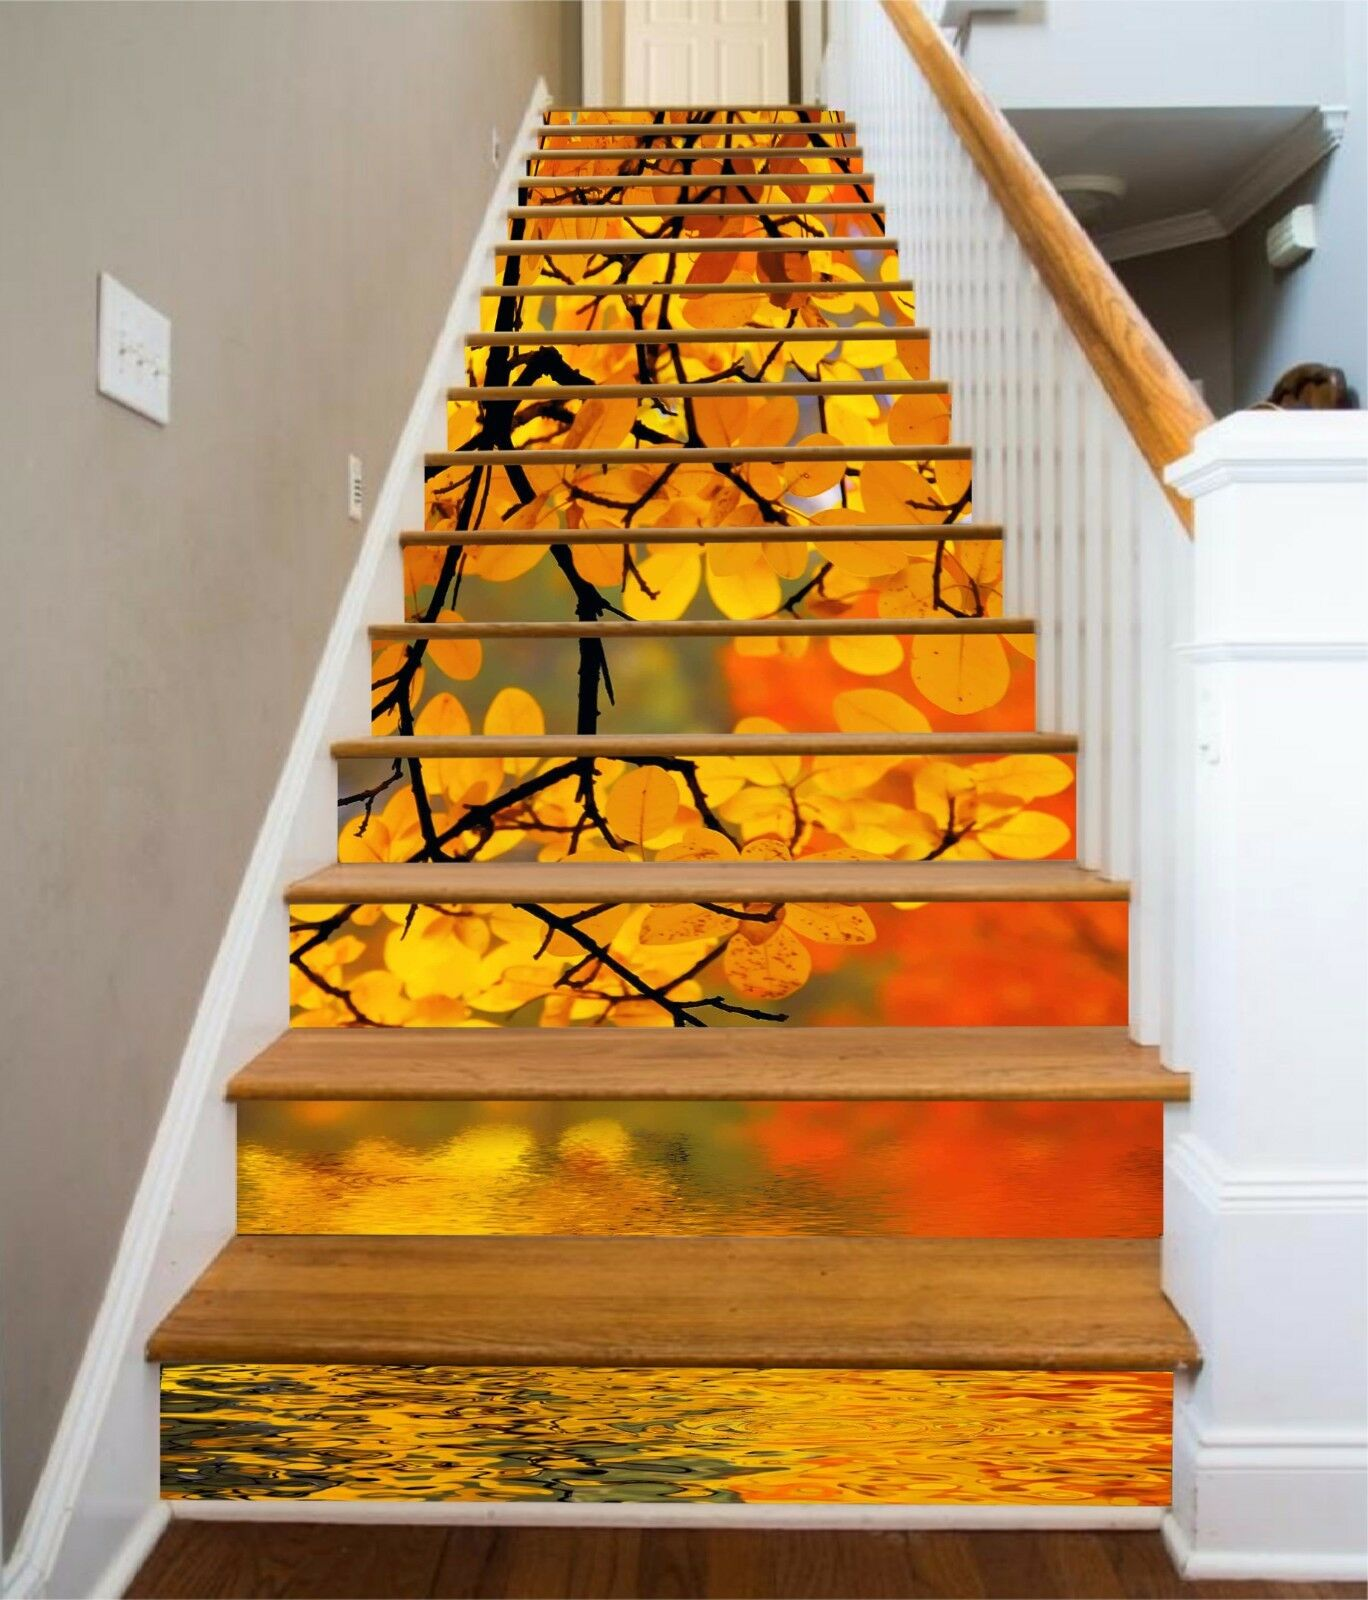 3D Gelb leaves 35 Stair Risers Decoration Photo Mural Vinyl Decal Wallpaper UK